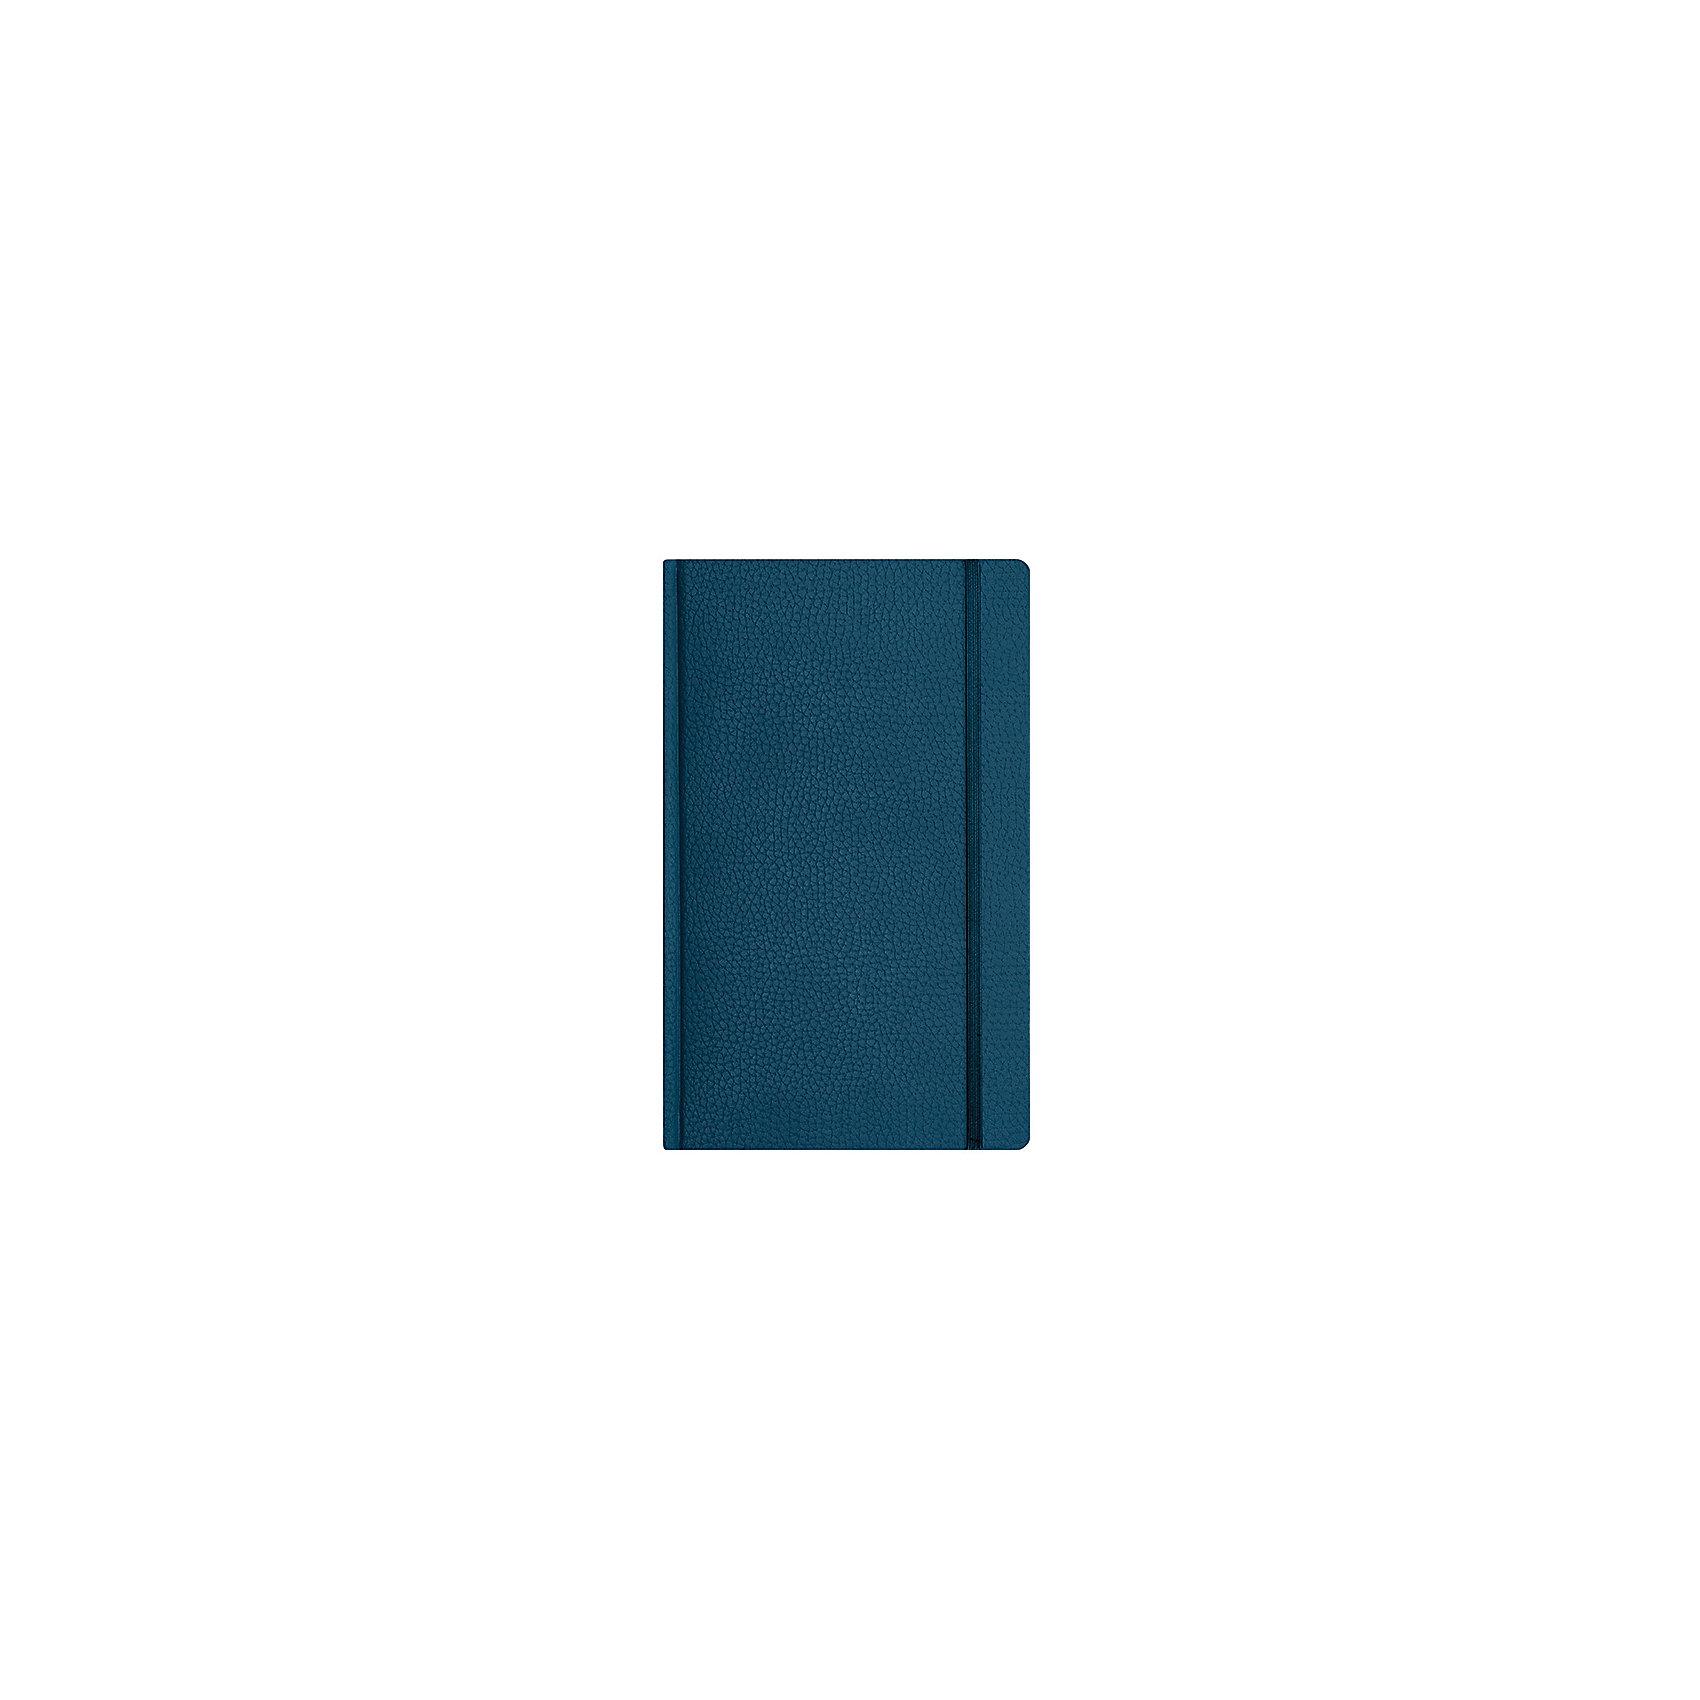 Записная книга, на резинке, 130х210, ARMONIA, Erich KrauseБумажная продукция<br>Записная книга, на резинке, 130х210, ARMONIA<br><br>Ширина мм: 130<br>Глубина мм: 210<br>Высота мм: 150<br>Вес г: 315<br>Возраст от месяцев: 204<br>Возраст до месяцев: 2147483647<br>Пол: Унисекс<br>Возраст: Детский<br>SKU: 5543316